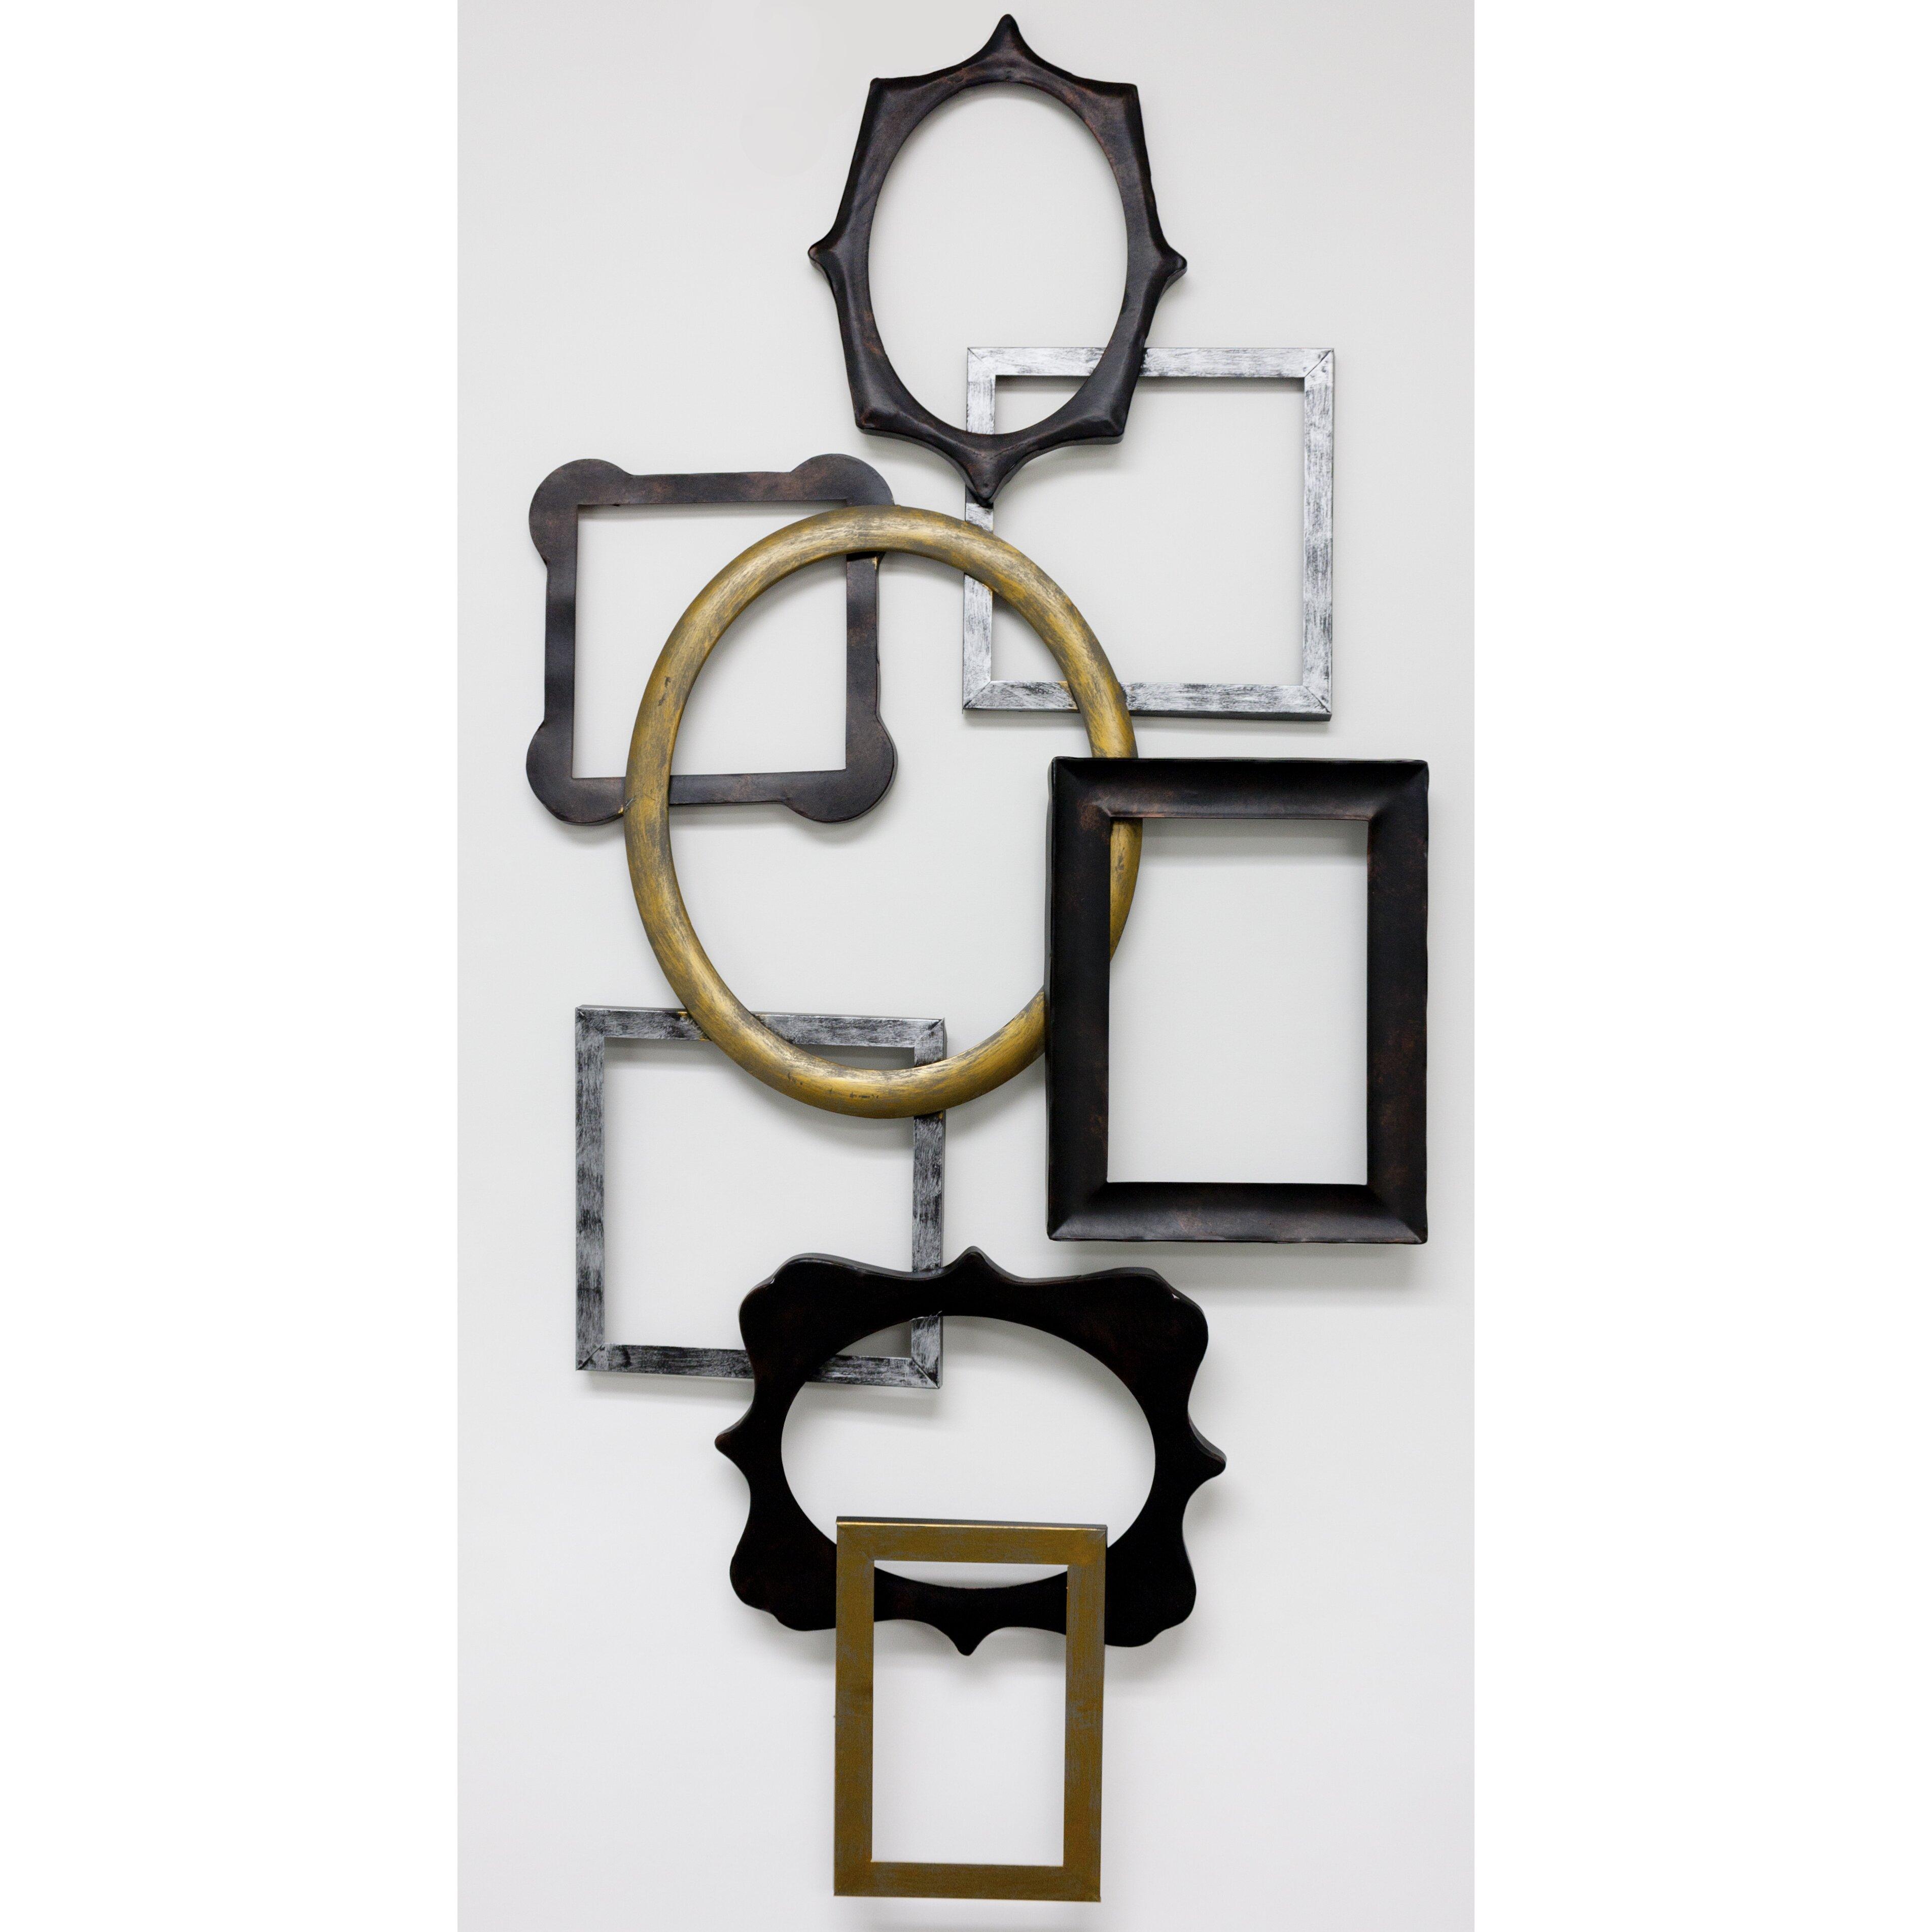 Http Www Wayfair Com Fetco Home Decor Tilden Geometric Shapes Wall D 25c3 25a9cor U1422 Fhk1591 Html